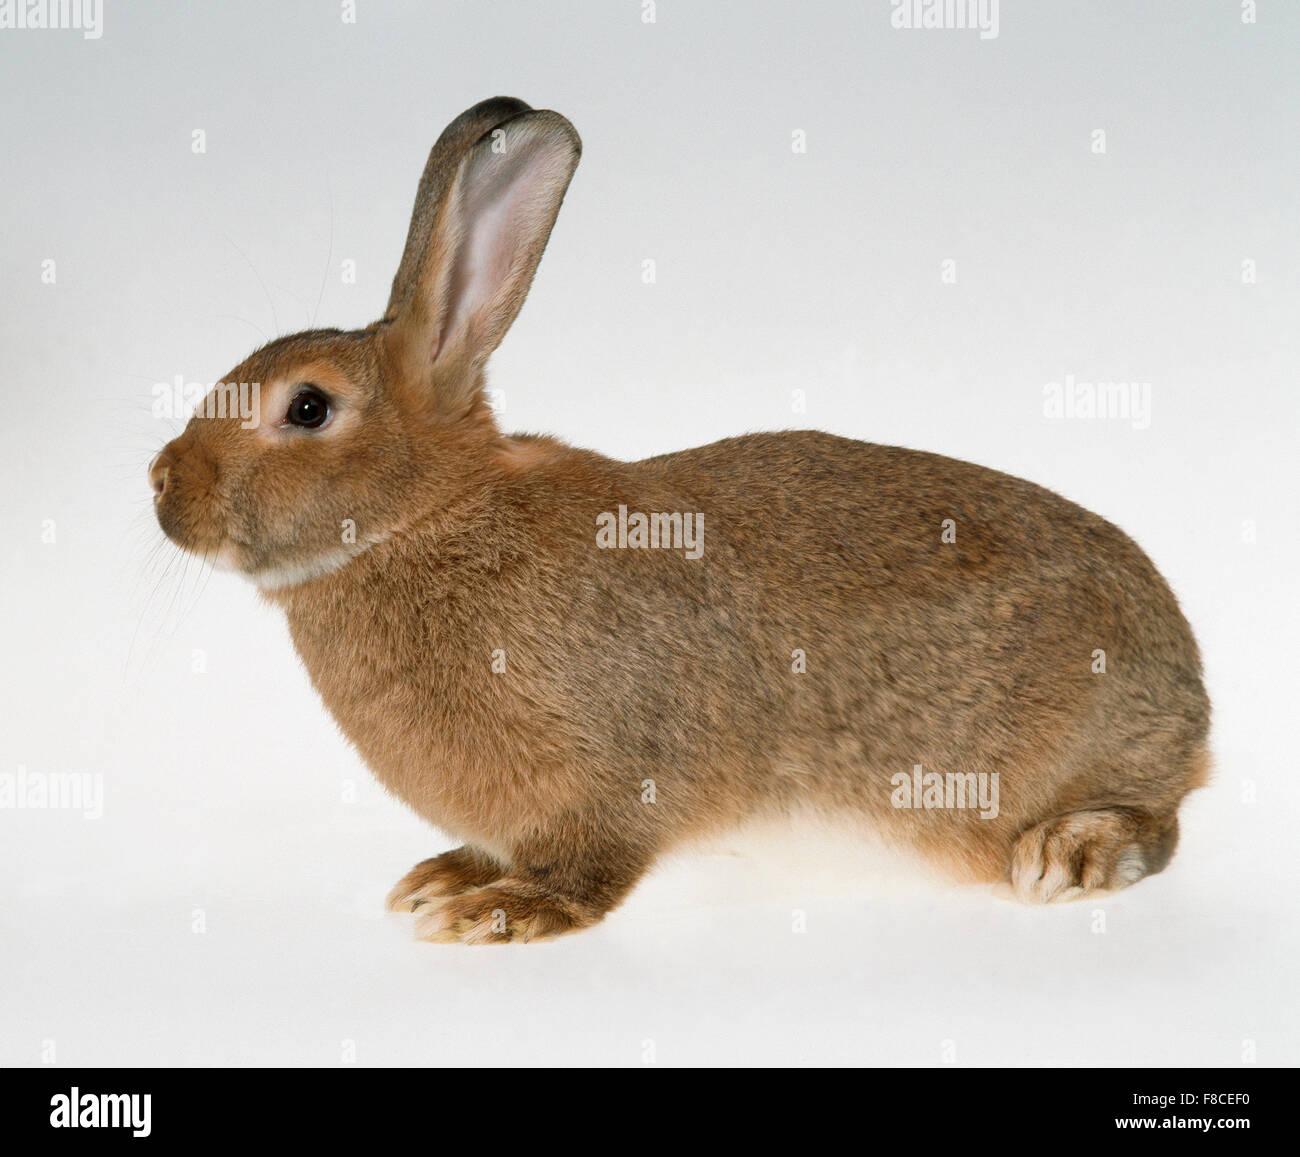 Conejo sobre un fondo neutro Foto de stock